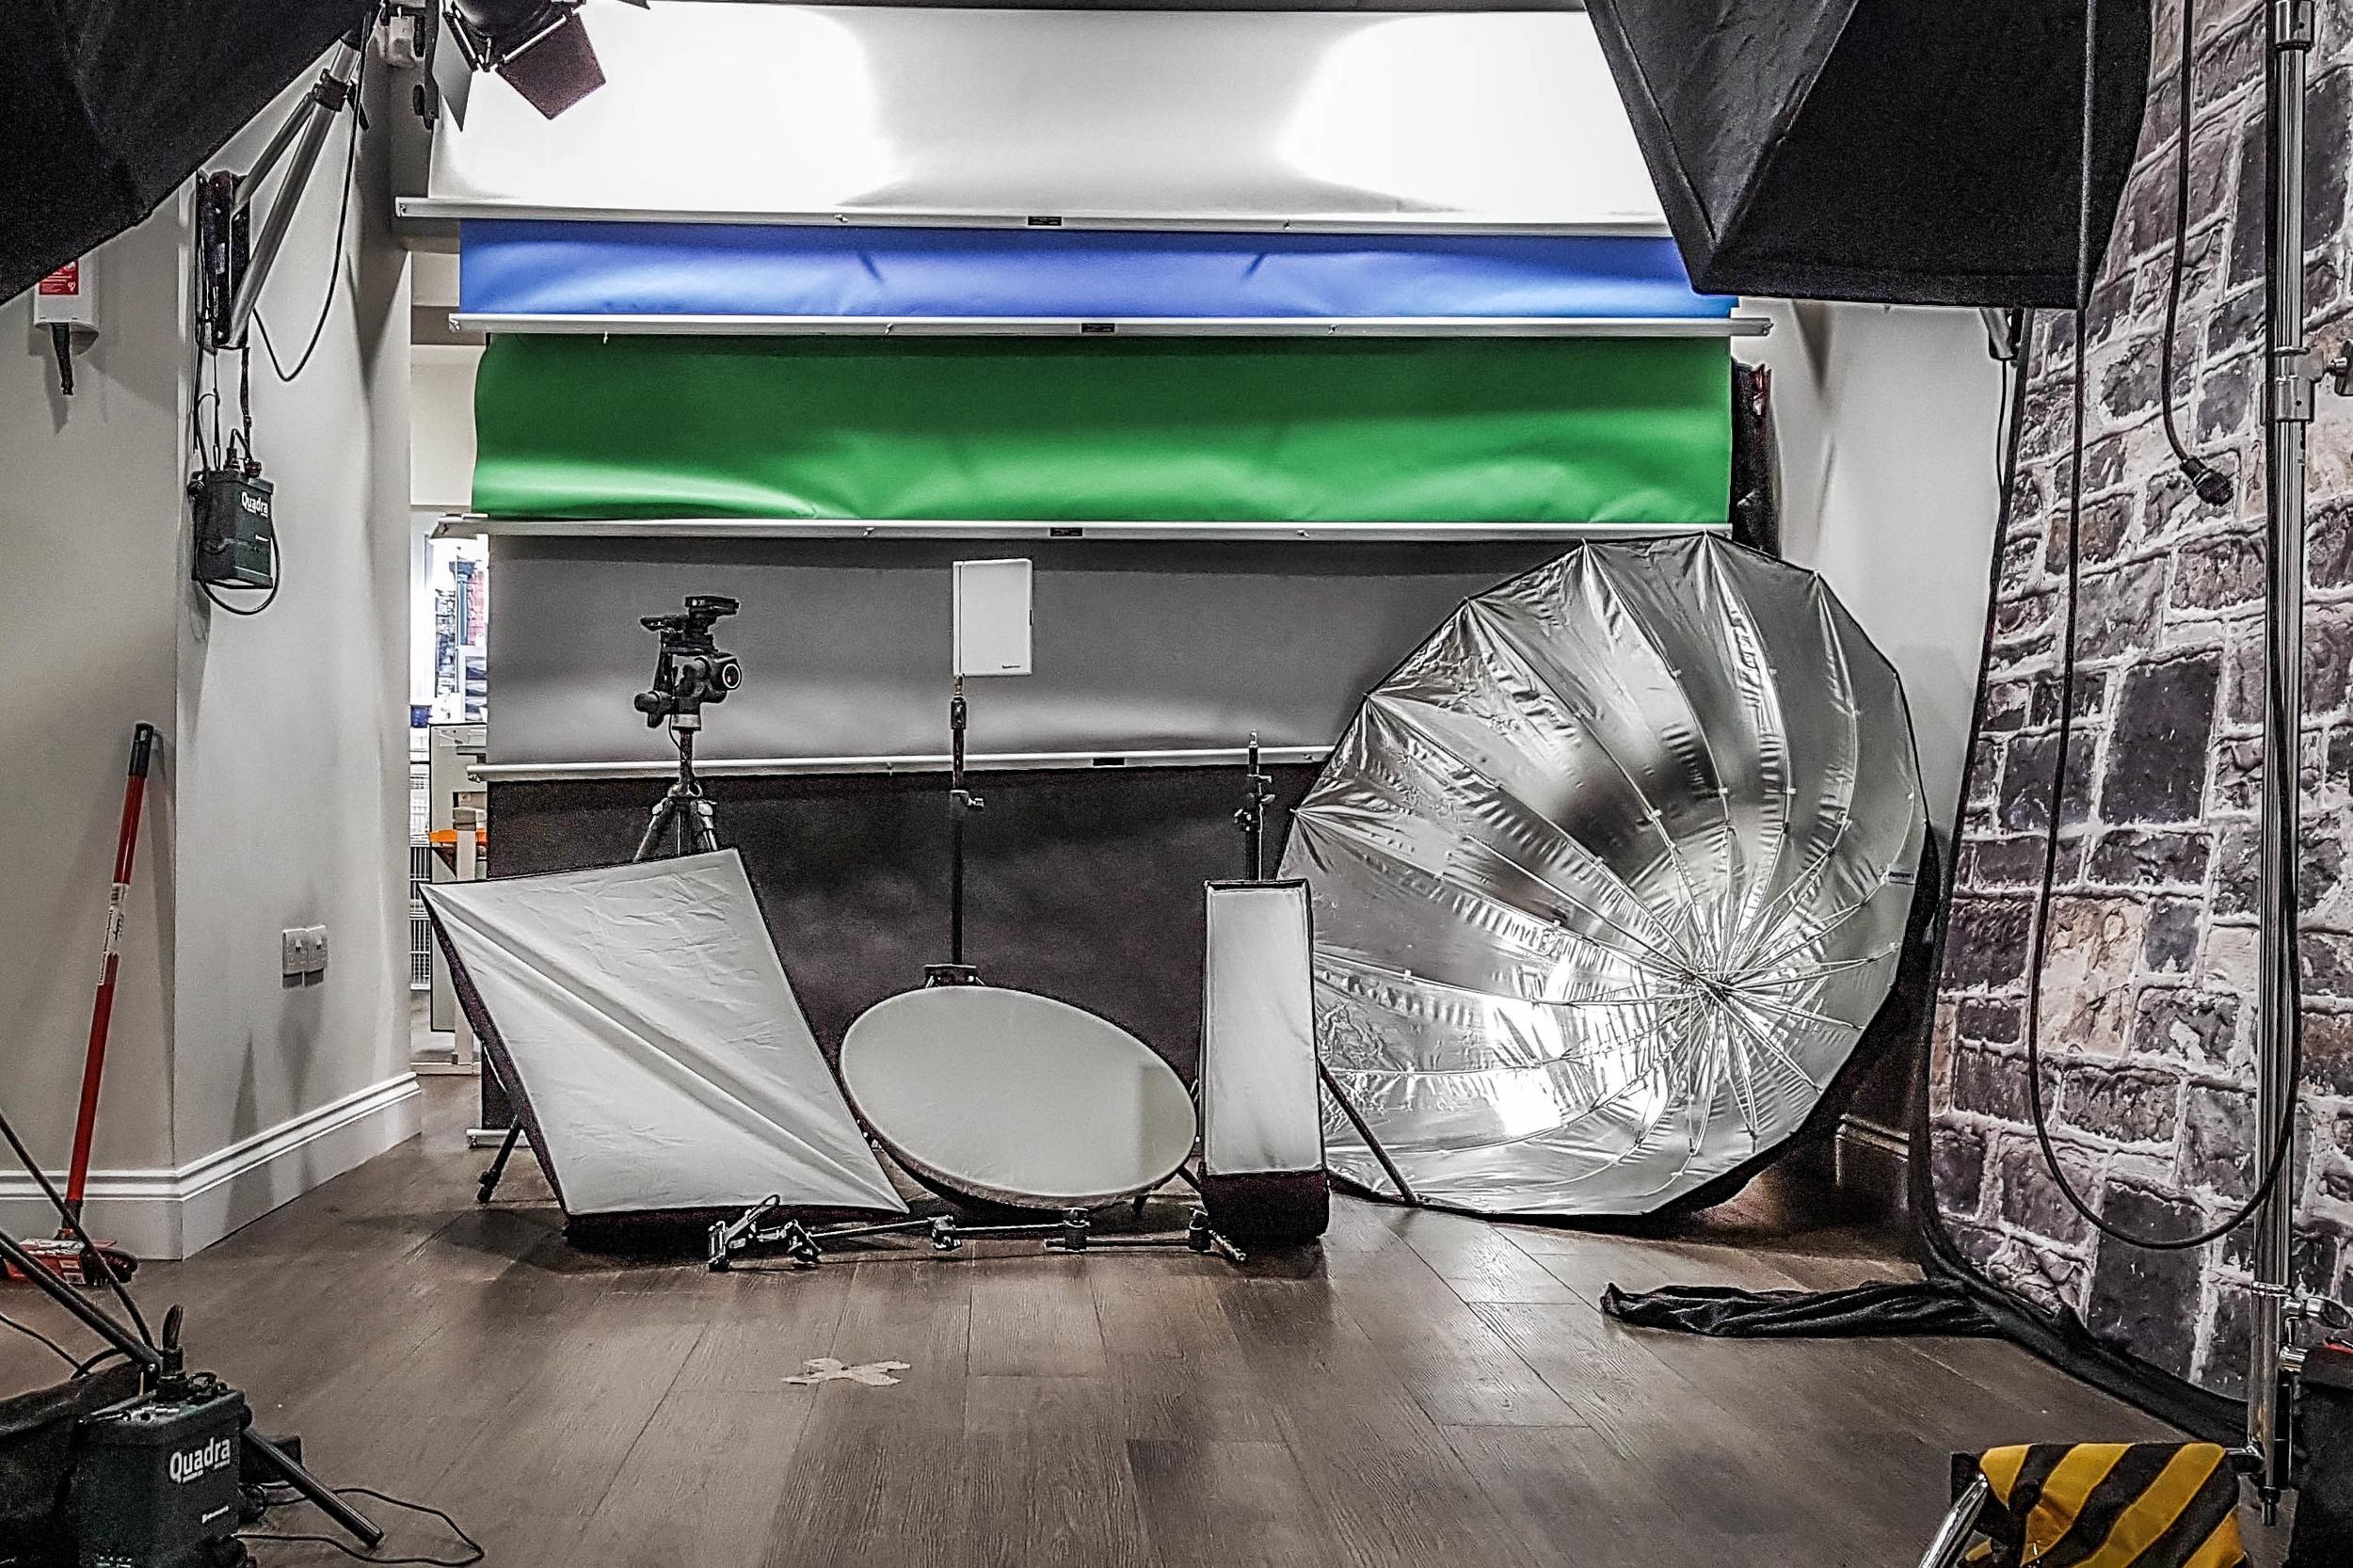 Studio Hire - Our Studio - Your Shoot